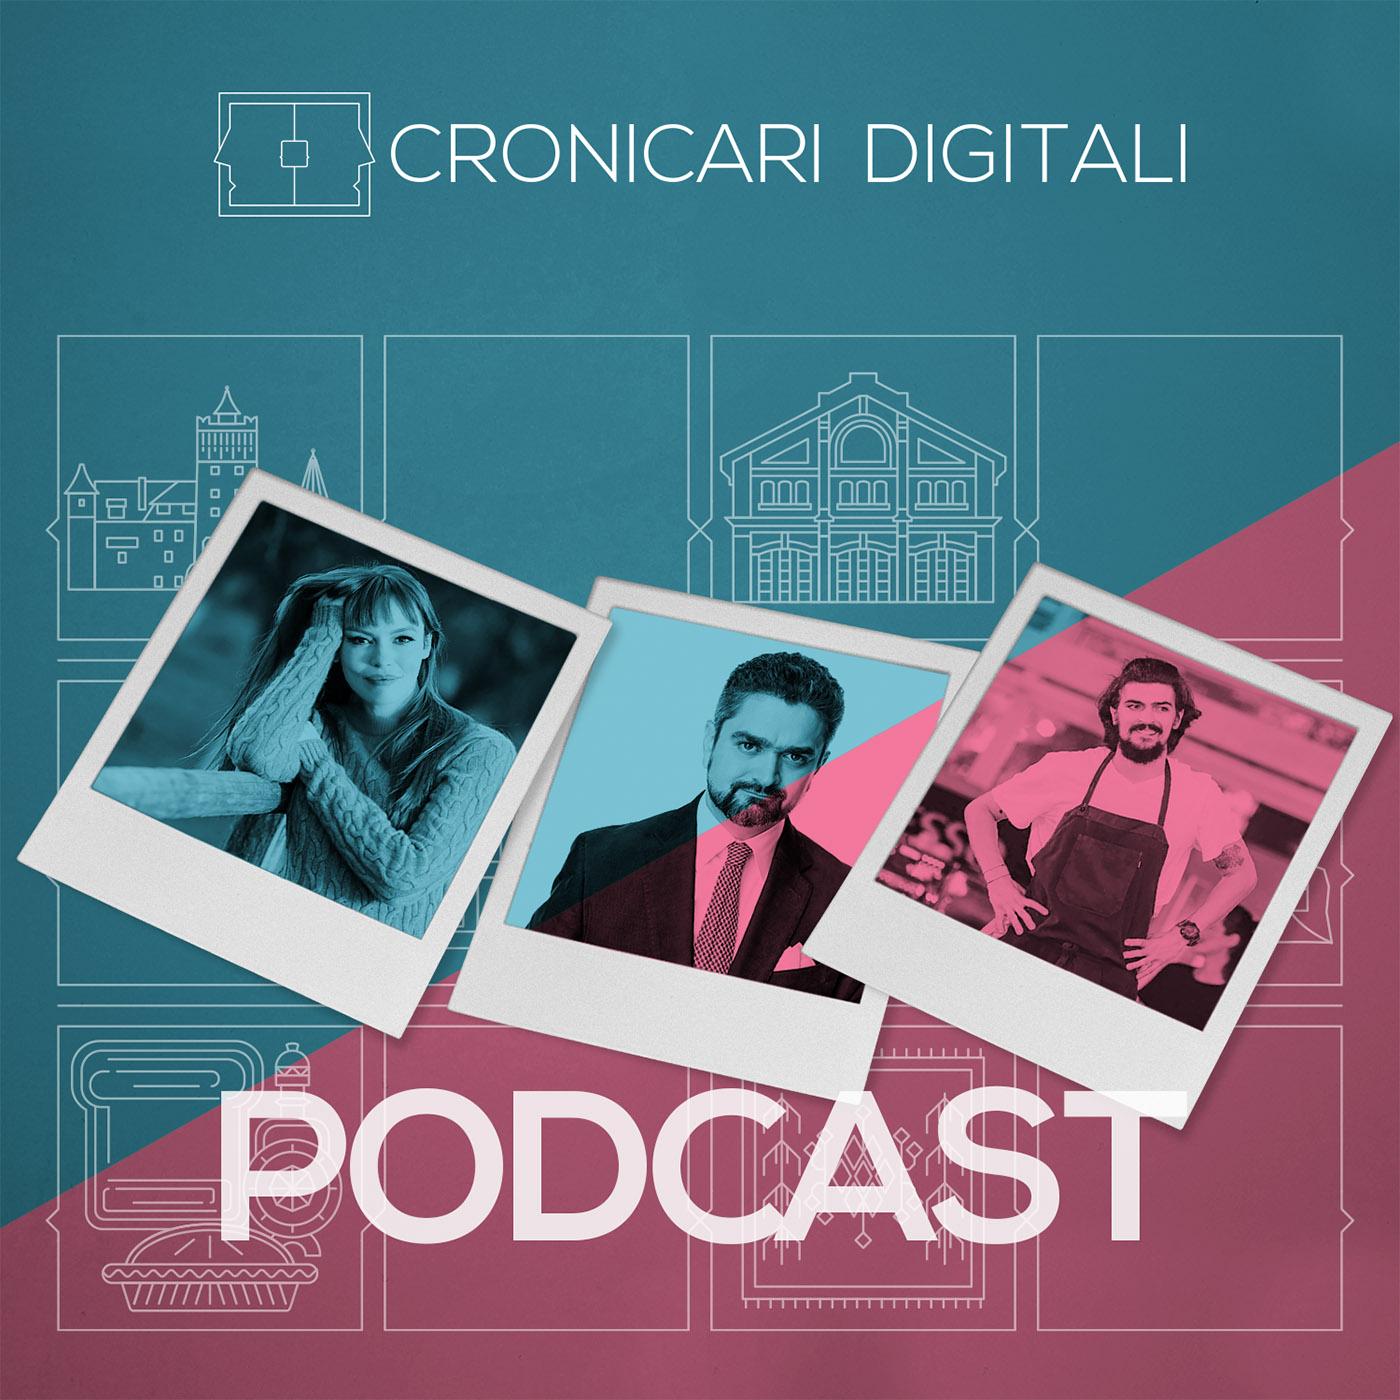 #cronicaridigitali S3 episod 8, Invitați Olimpia Melinte, Theodor Paleologu și Chef Alex Petricean